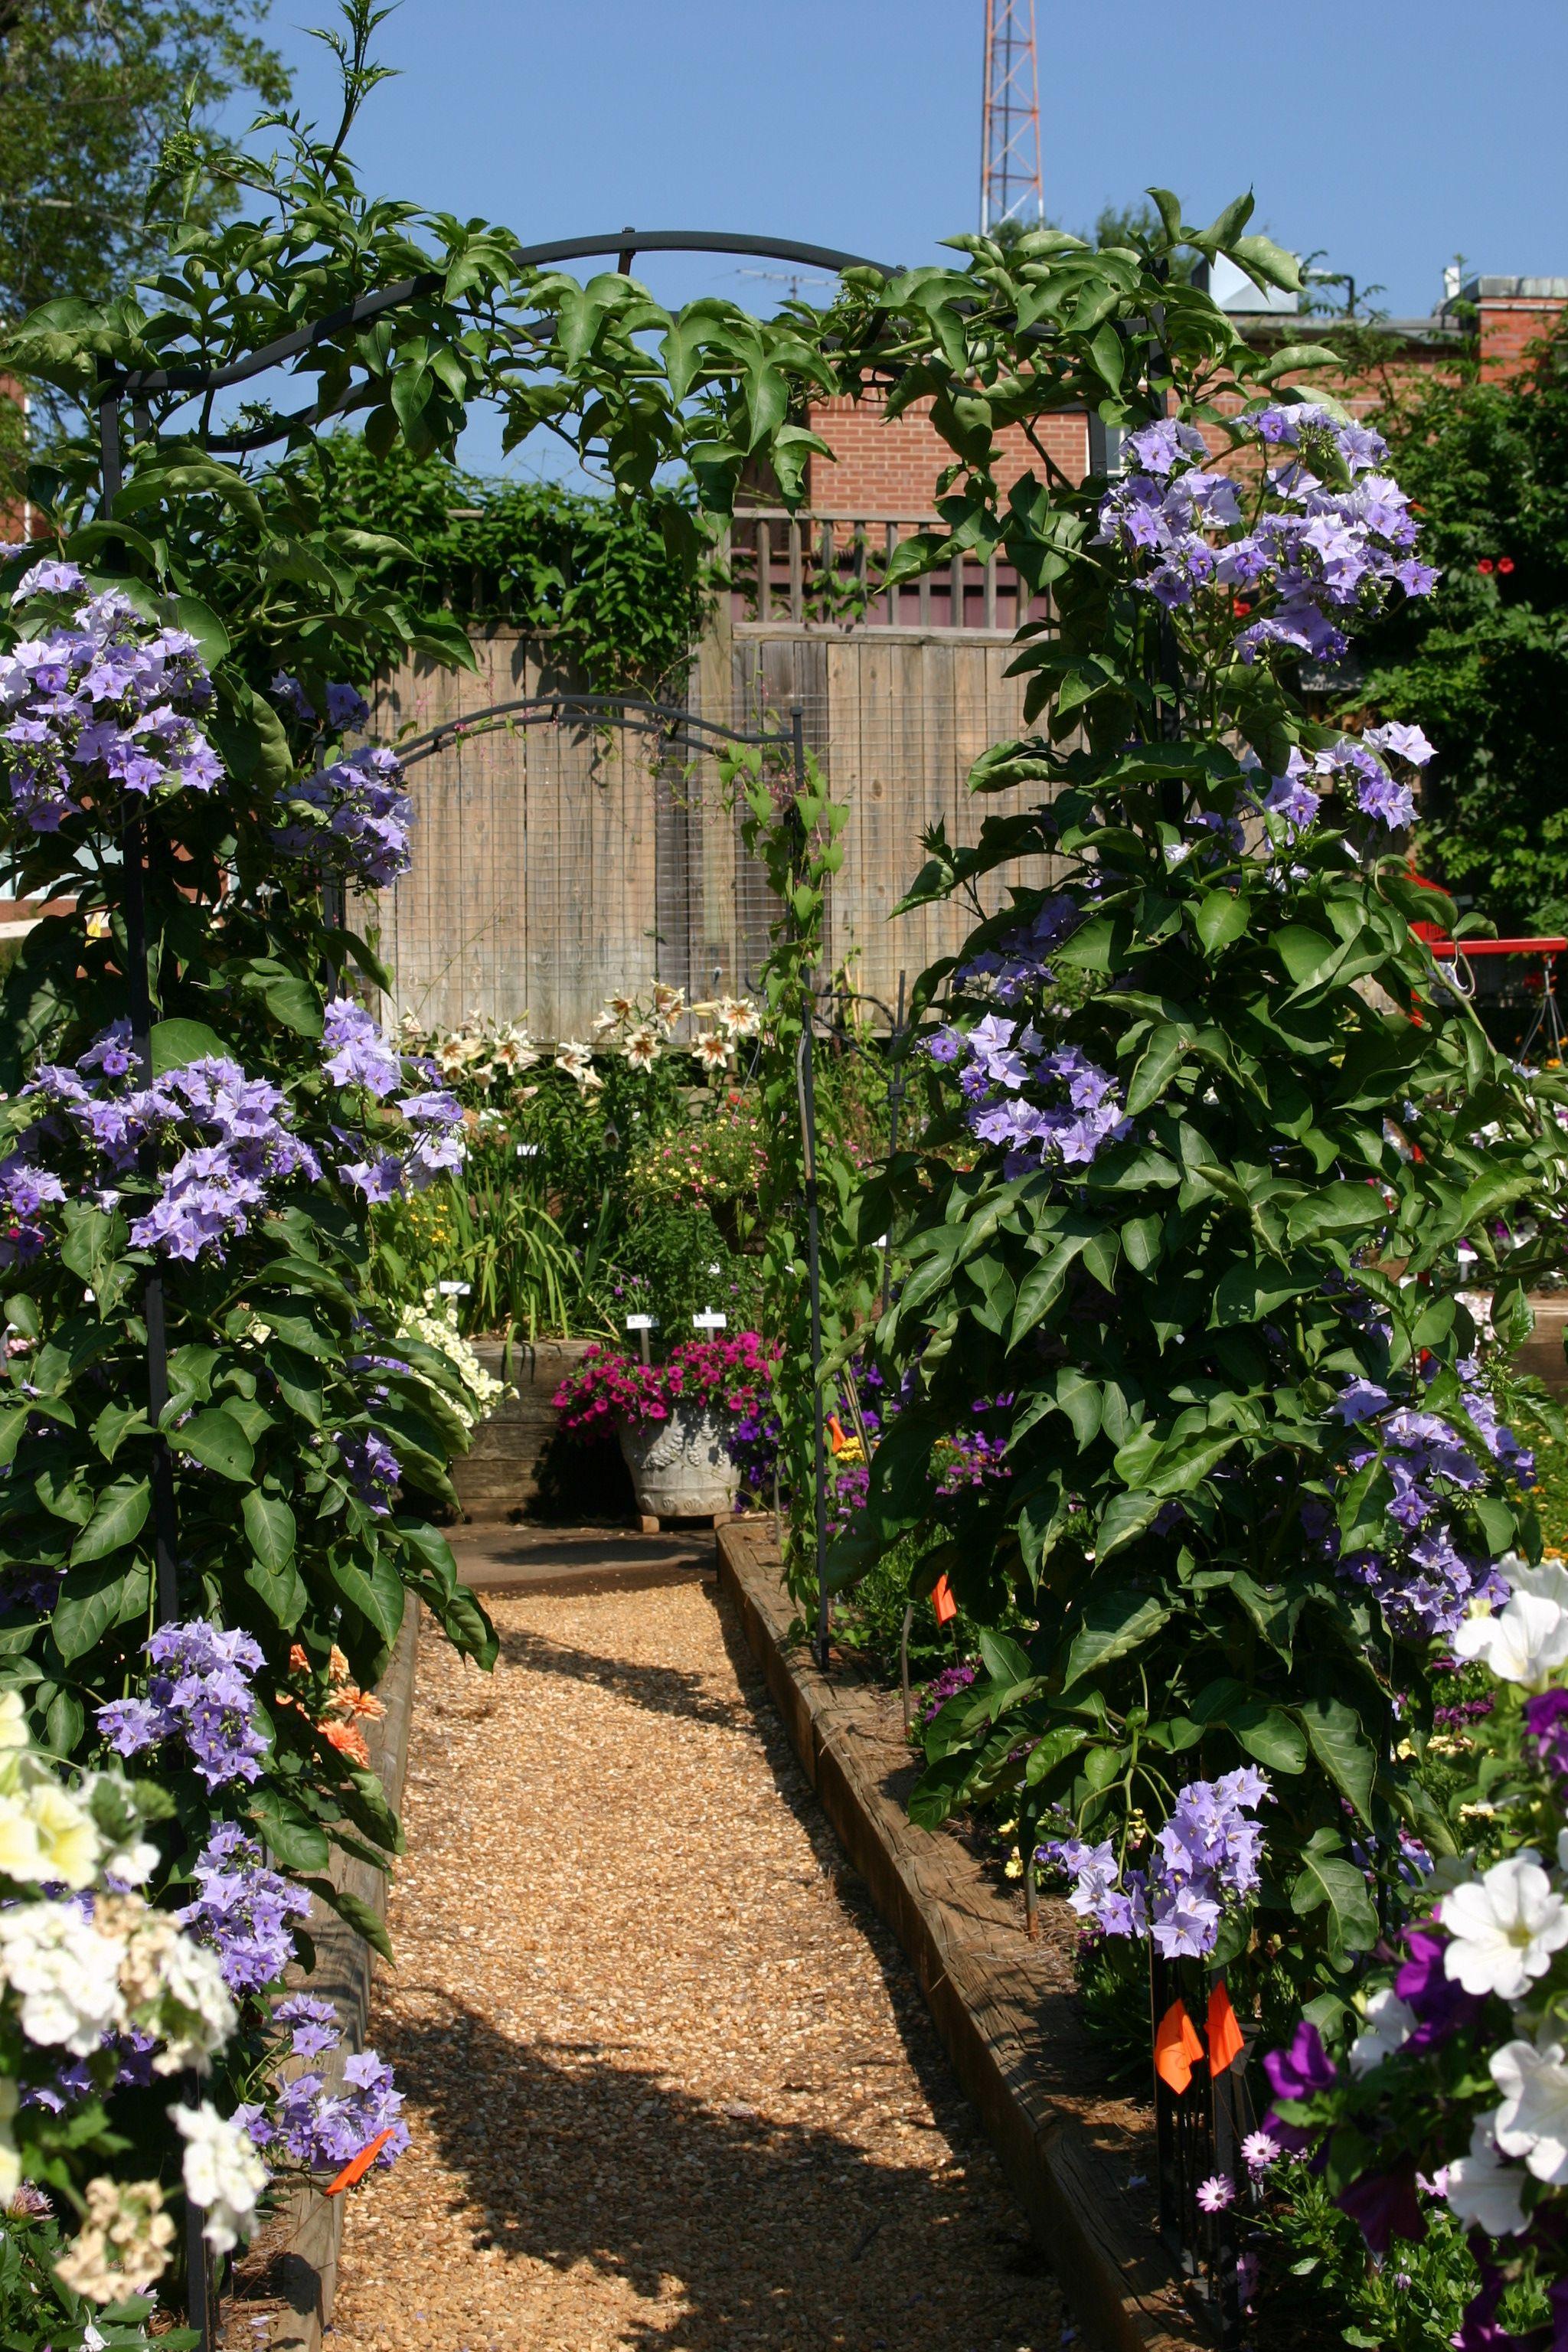 Solanum Wendlandii Vine (Giant Potato, Paradise, Divorce Blue Gardengarden